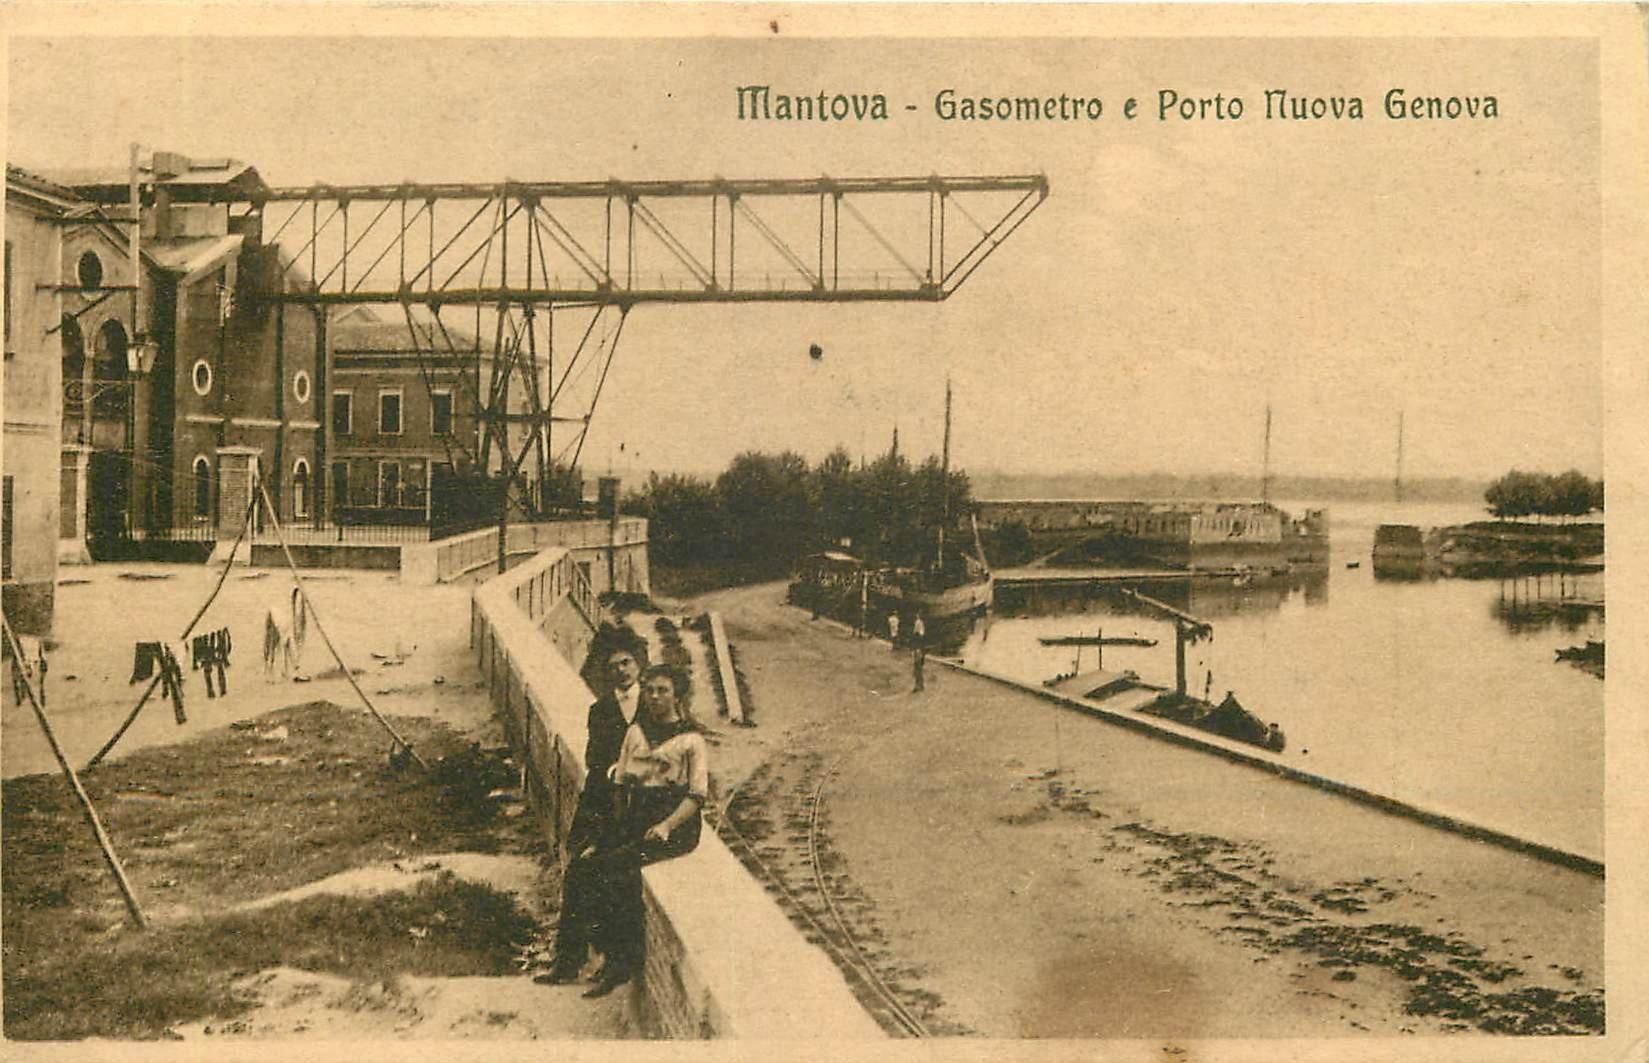 WW MANTOVA. Gasometro e Porto Nuova Genova